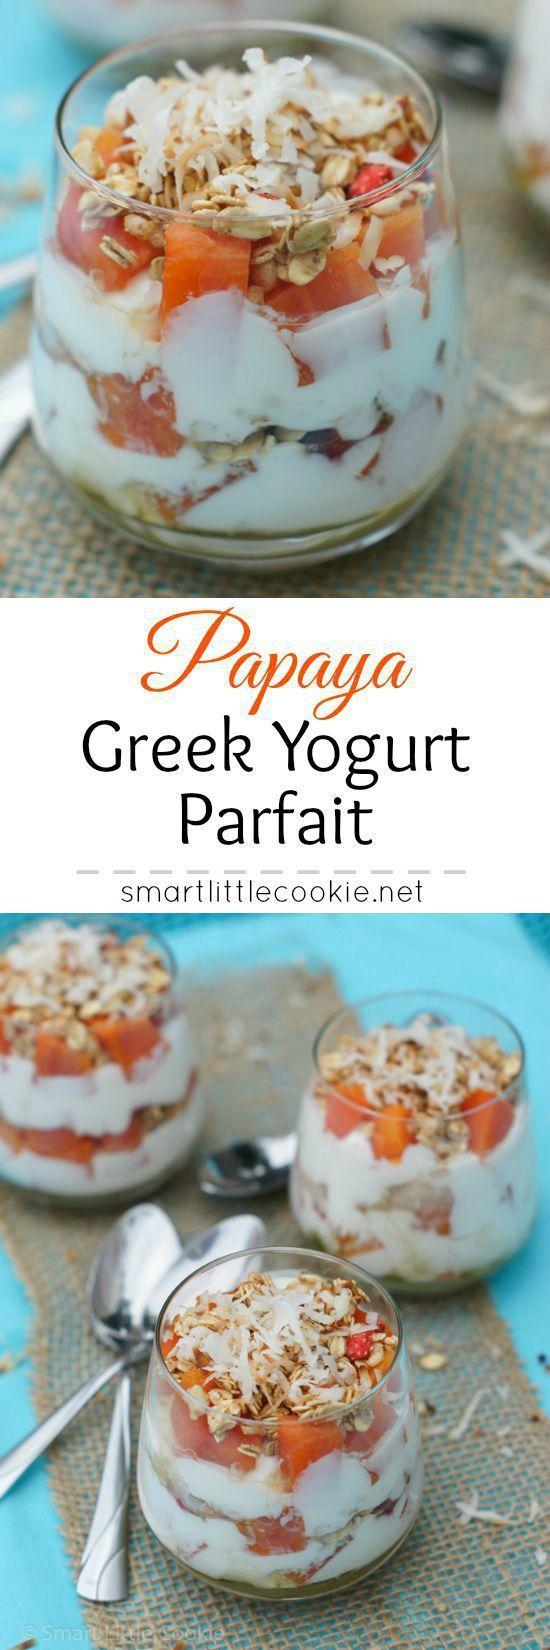 Papaya Greek Yogurt Parfait | http://smartlittlecookie.net